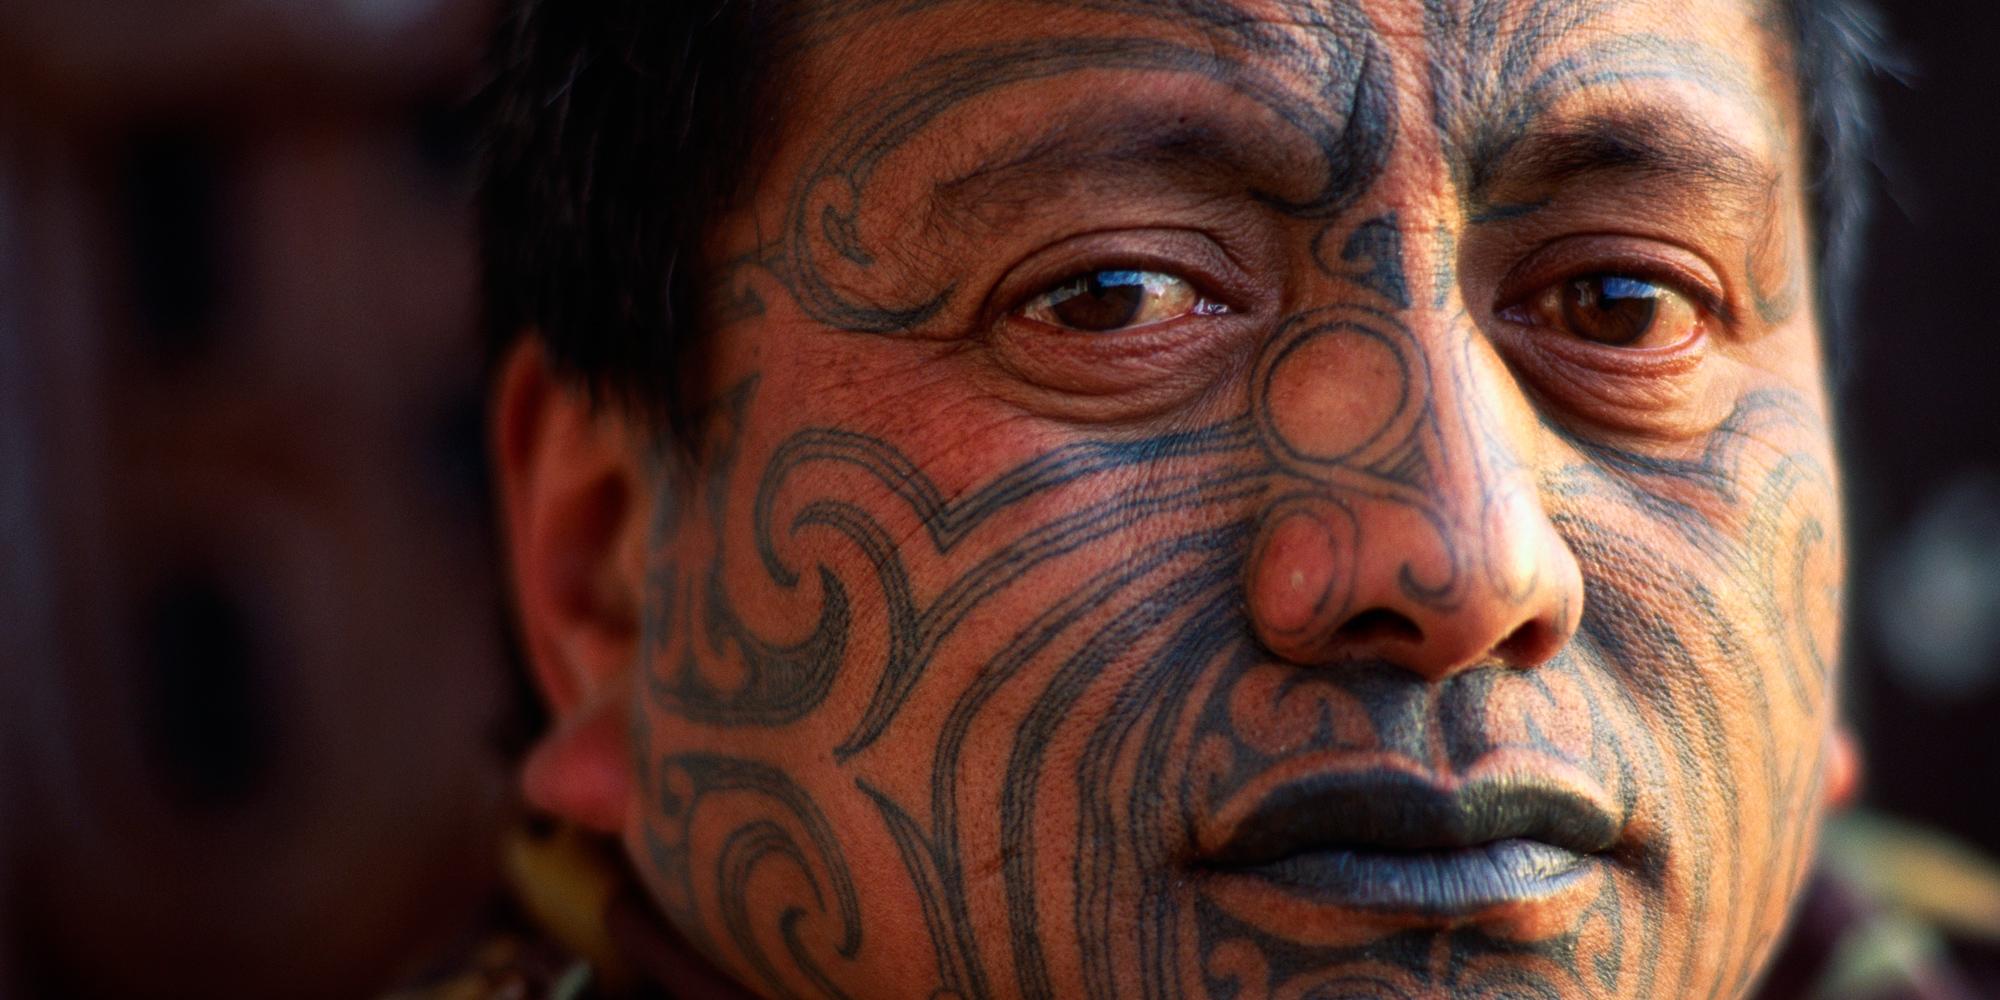 Представитель народа маори